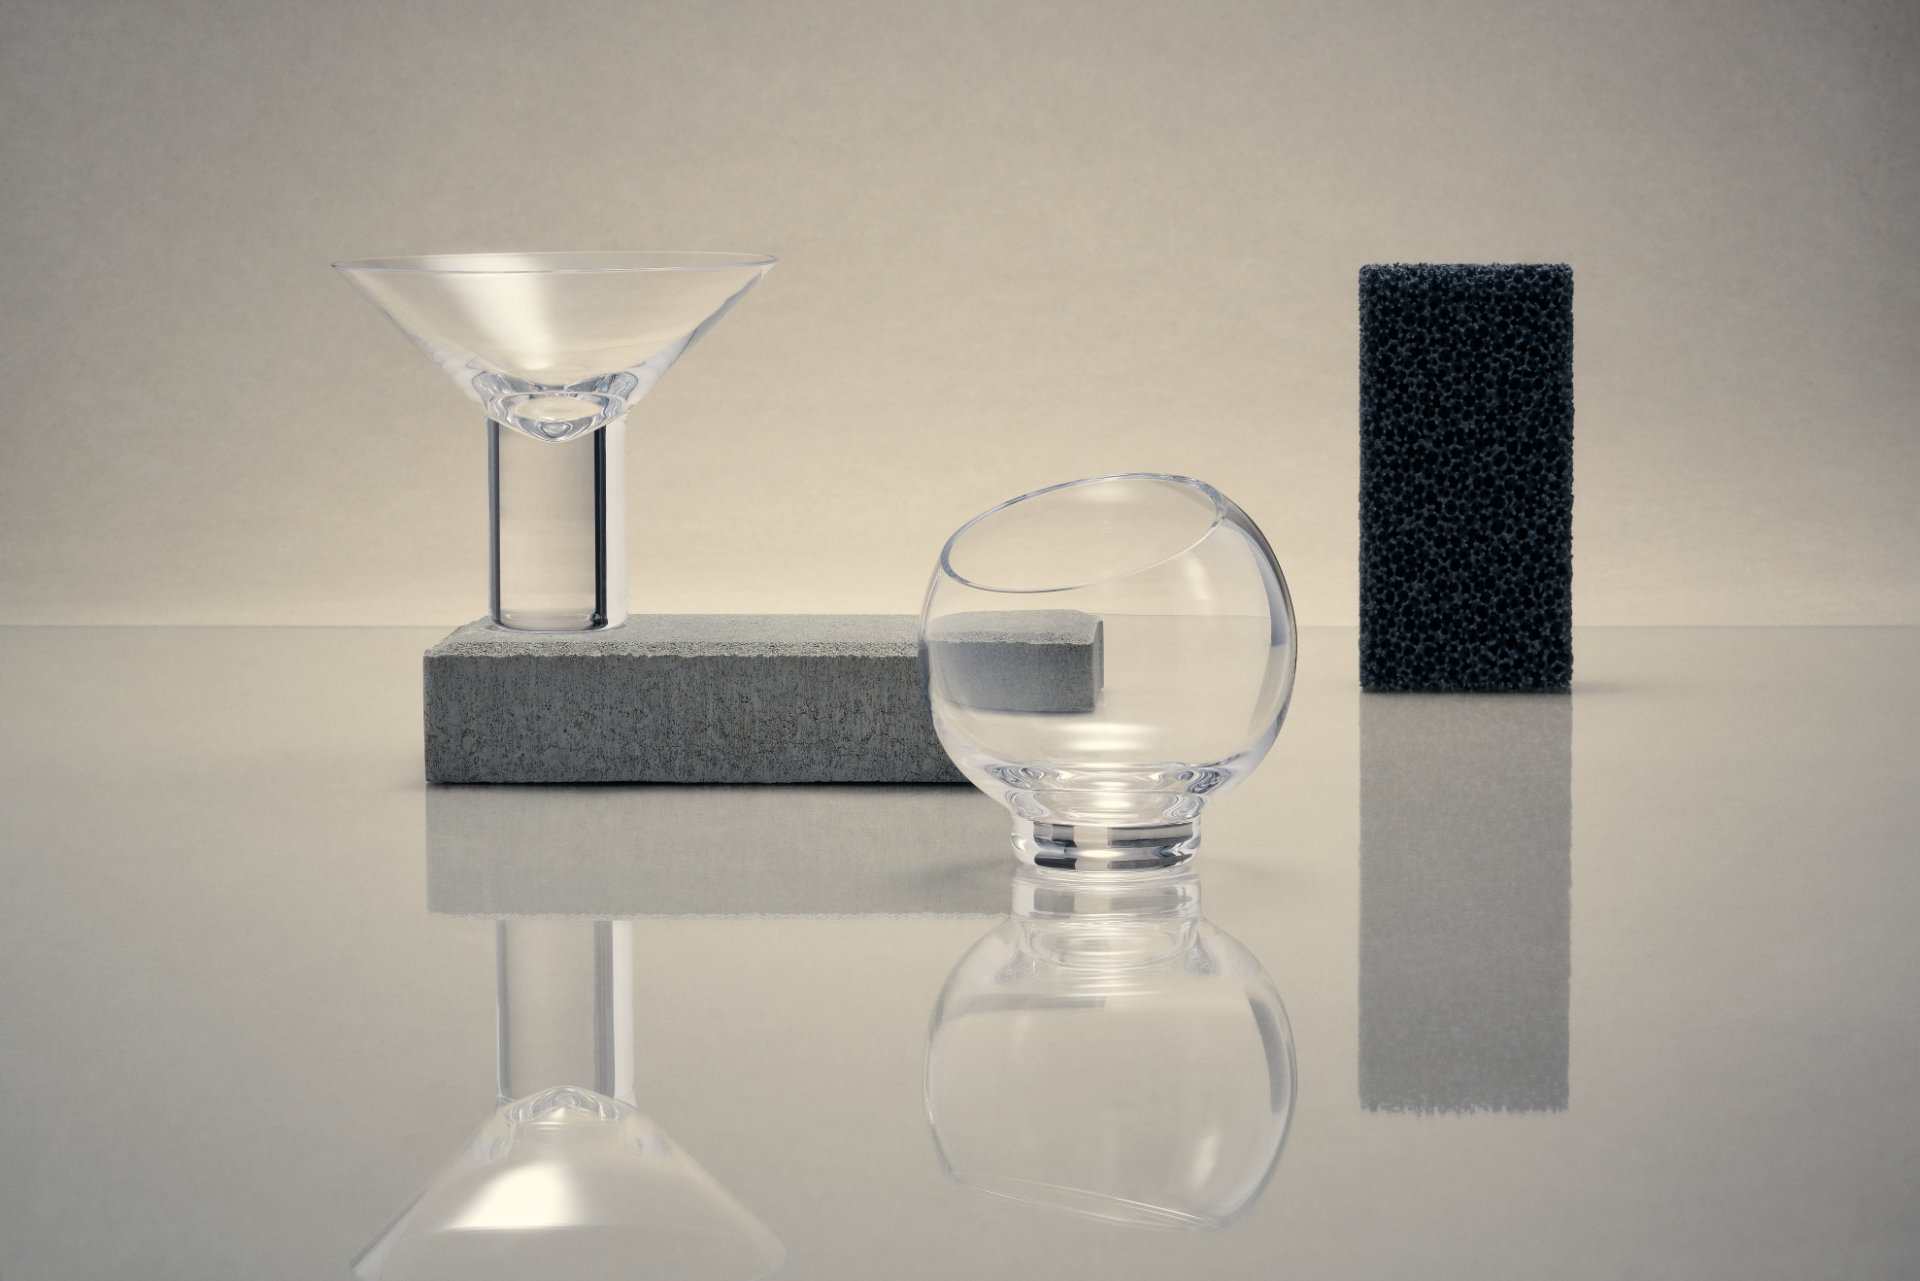 BrandDoctor | 2 choices: take a sip of LUCK or do you Primitivo? 4